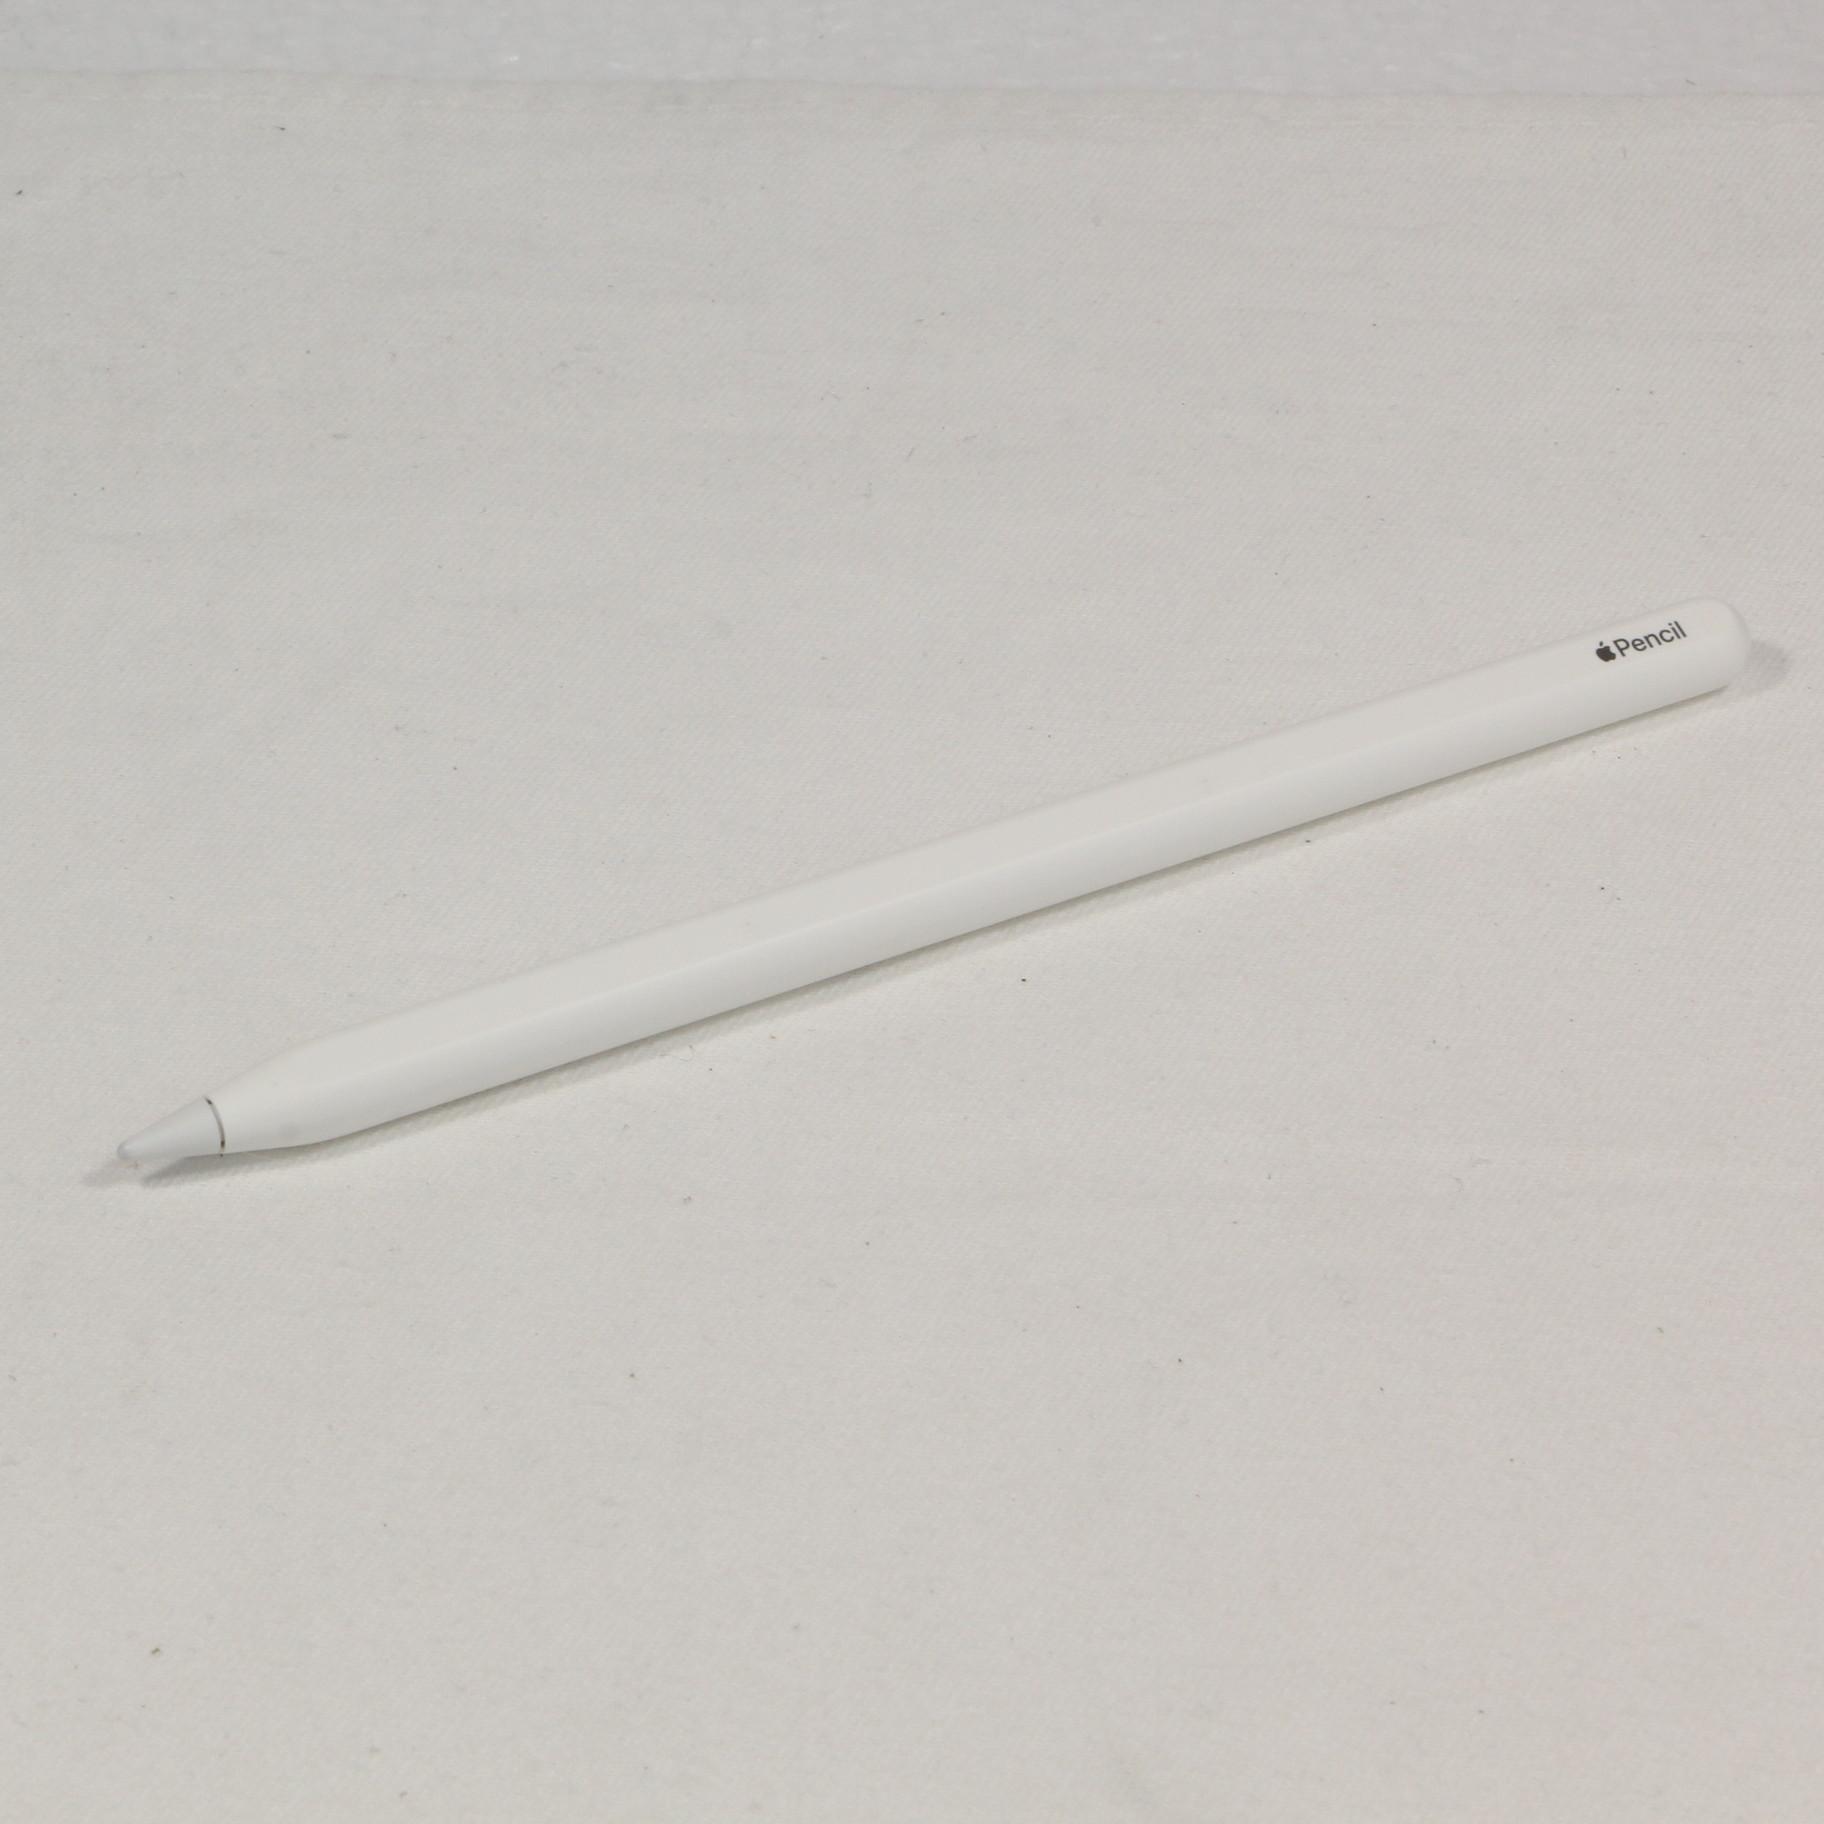 世代 apple pencil 第 二